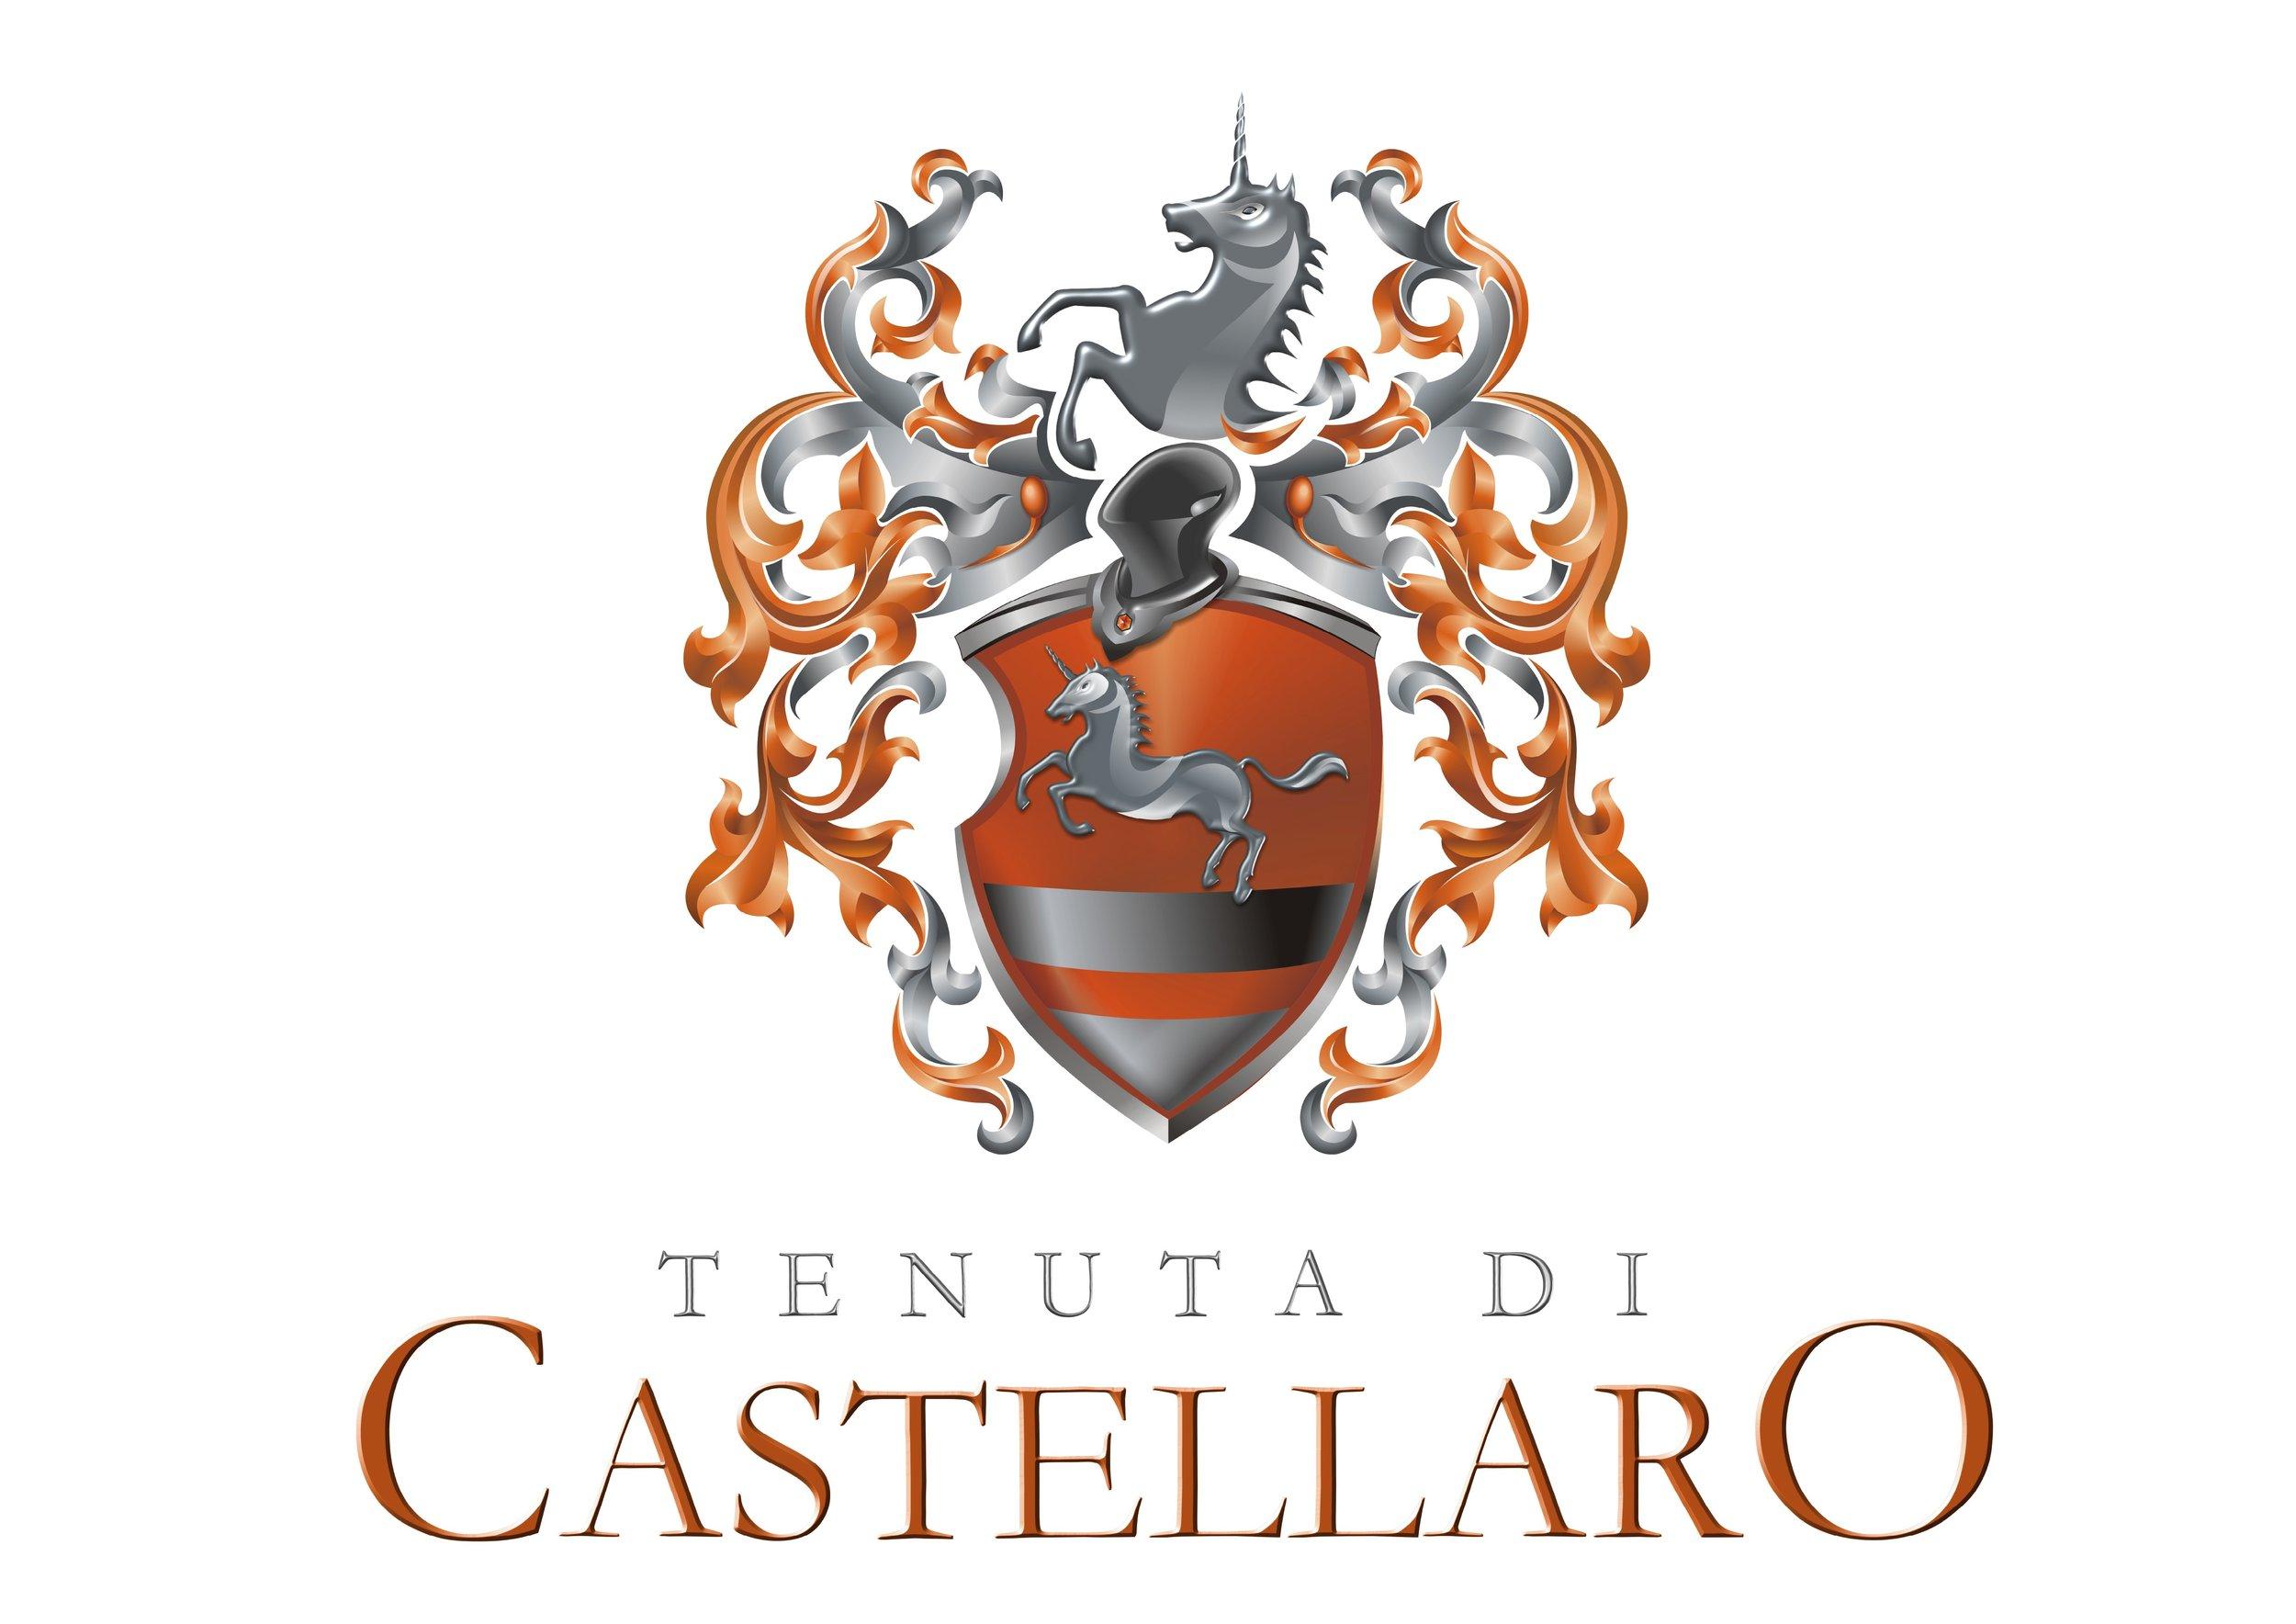 Tenuta di Castellaro -Quattropani